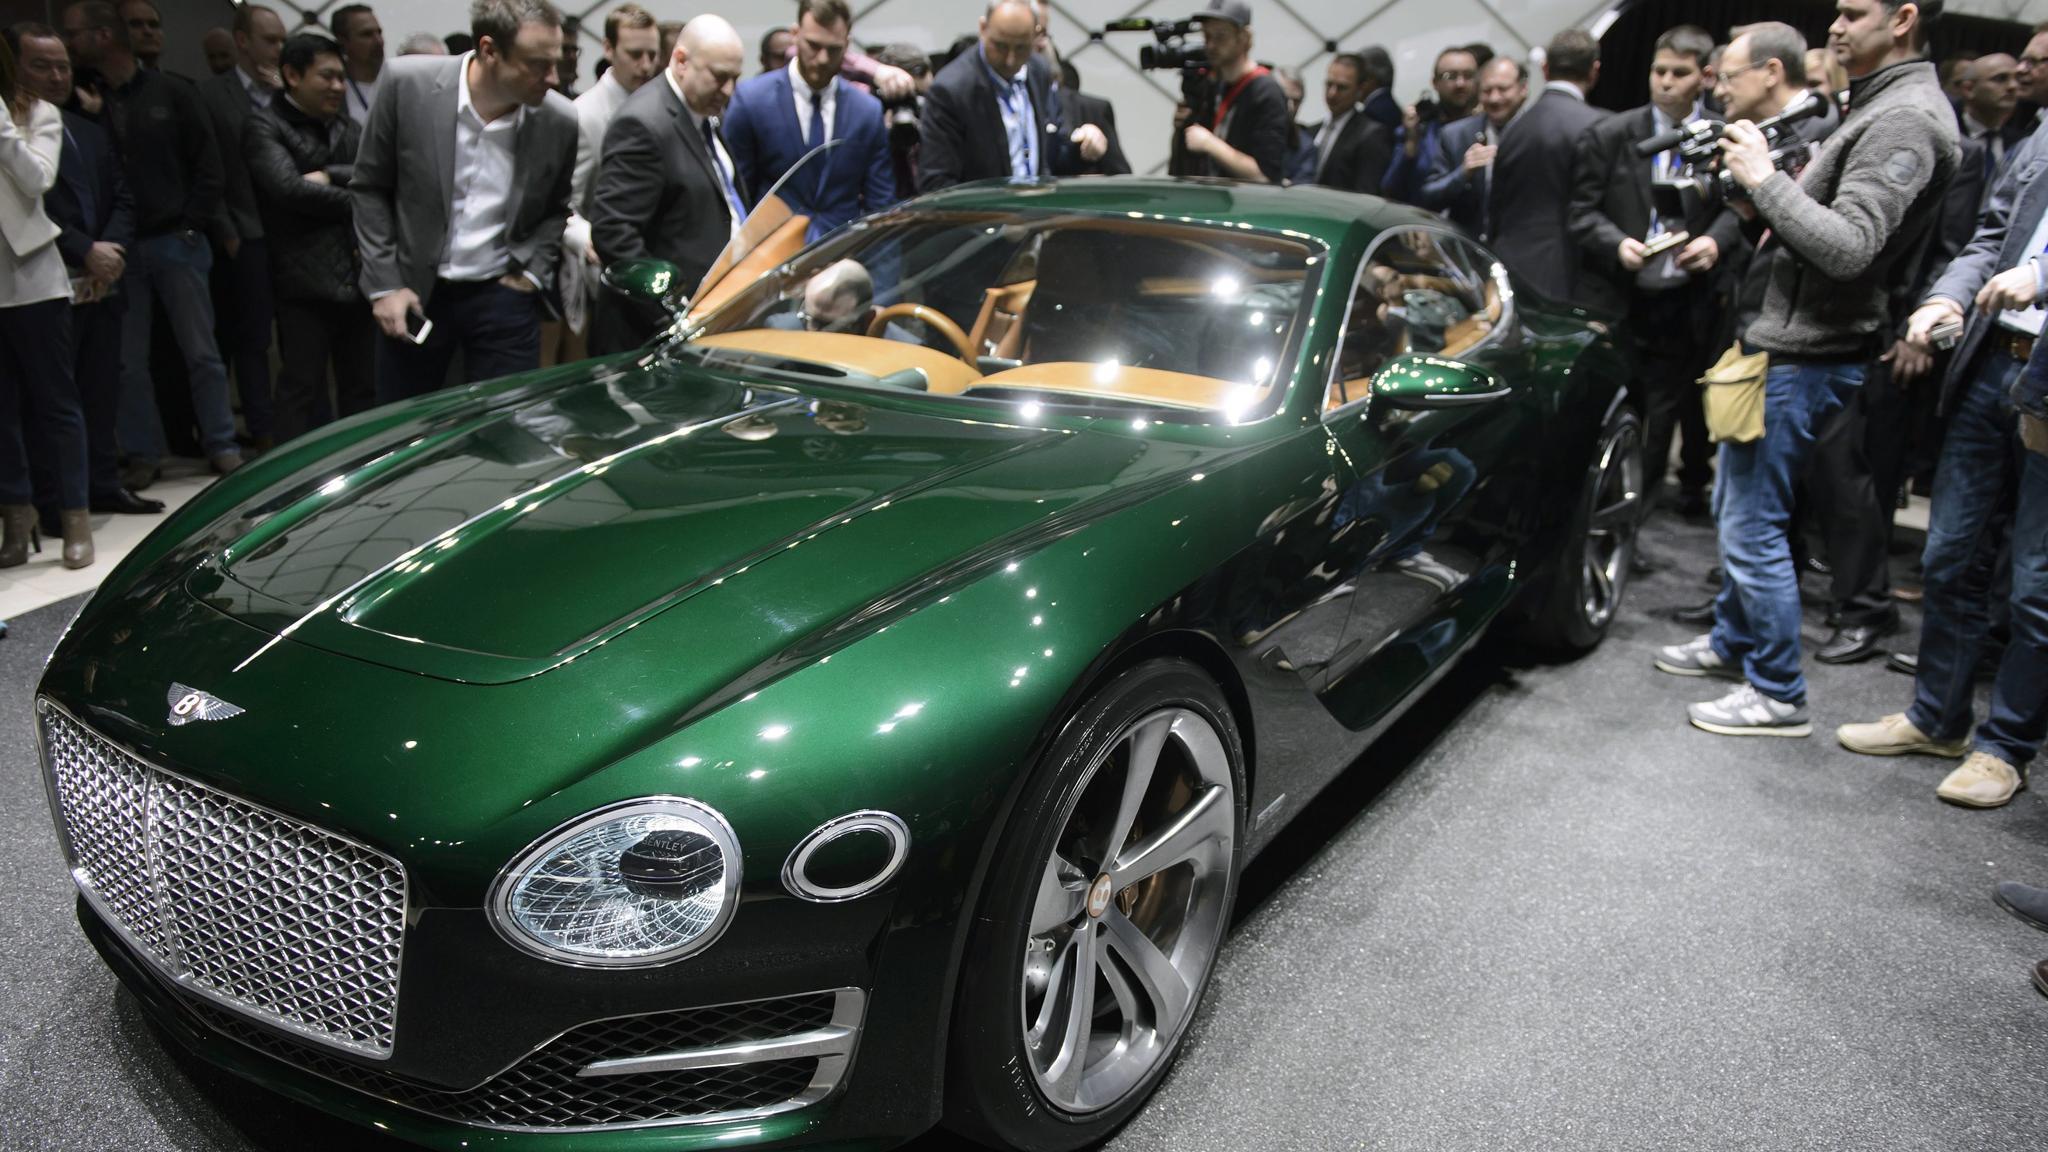 Bentley And Aston Martin Shift Gears At Geneva Motor Show Financial Times